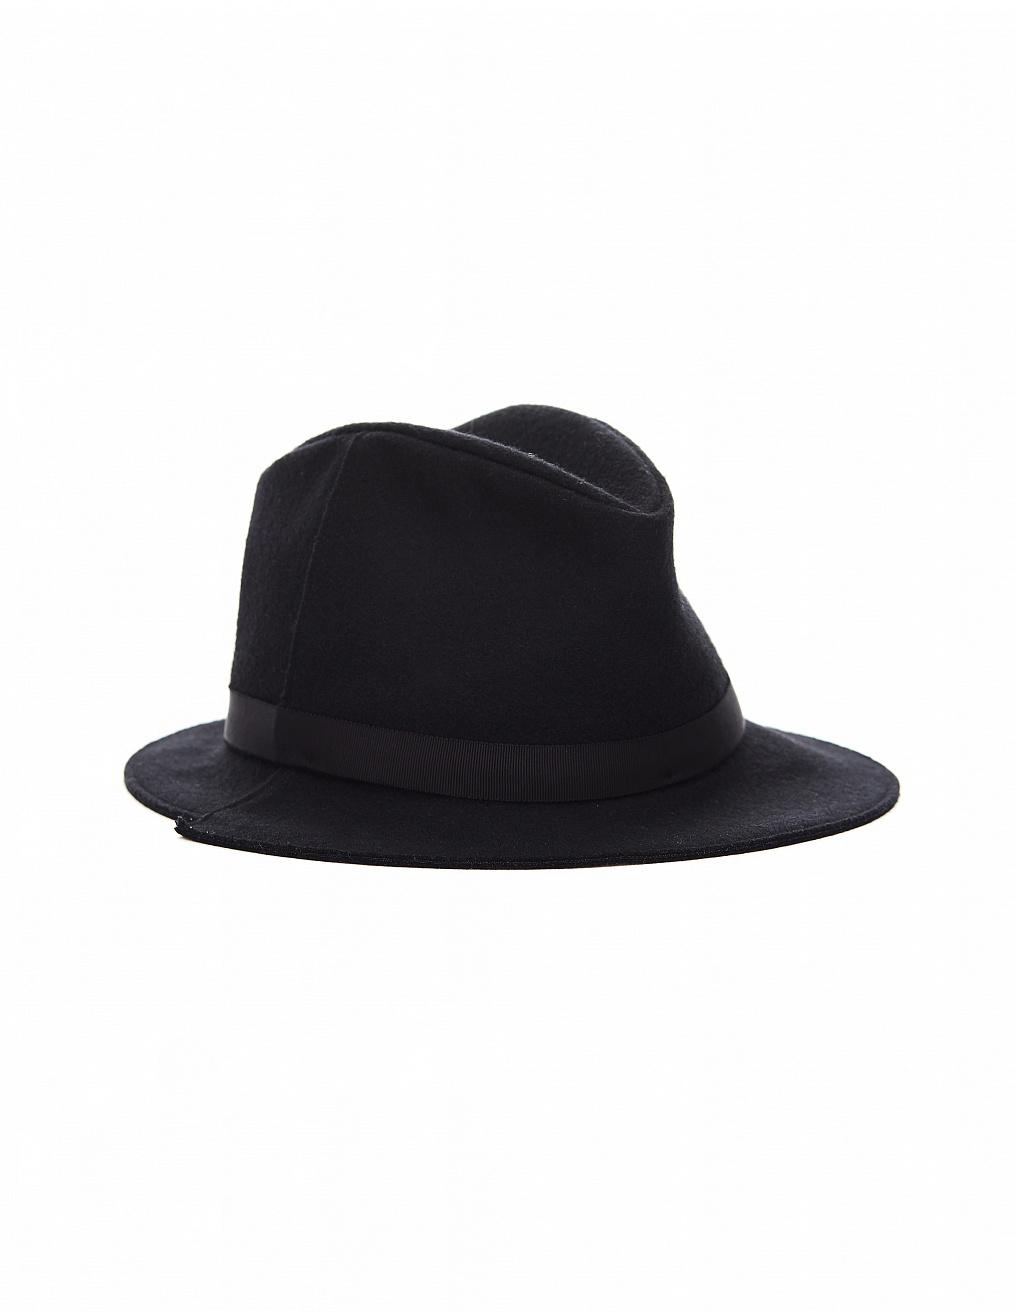 Yohji Yamamoto Black Wool Hat In White